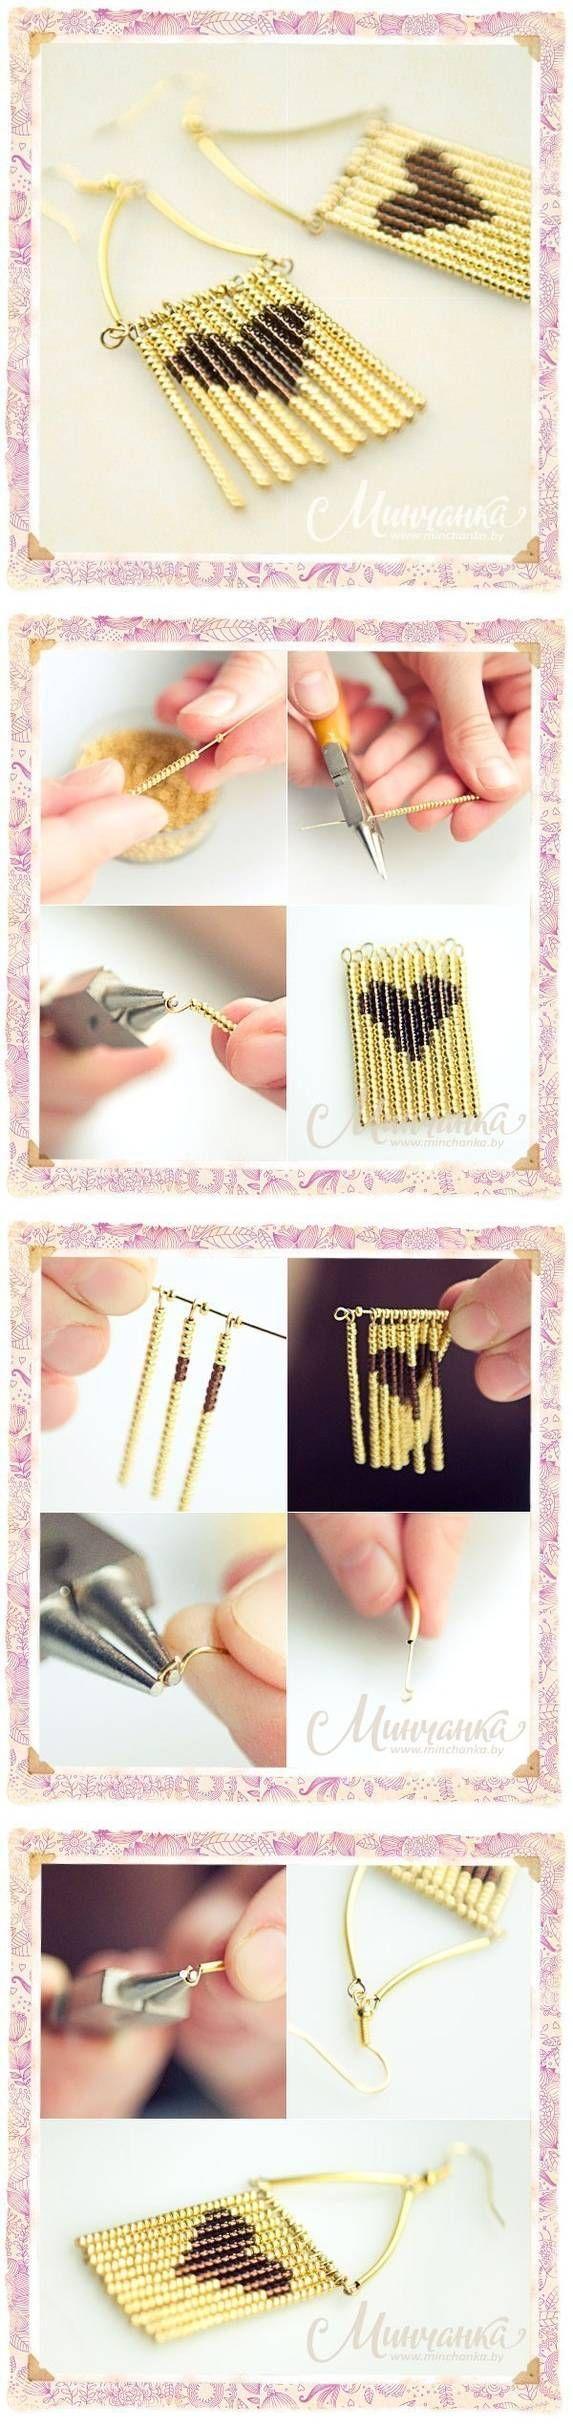 DIY Beads Mosaic Heart Earrings | iCreativeIdeas.com Like Us on Facebook ==> https://www.facebook.com/icreativeideas